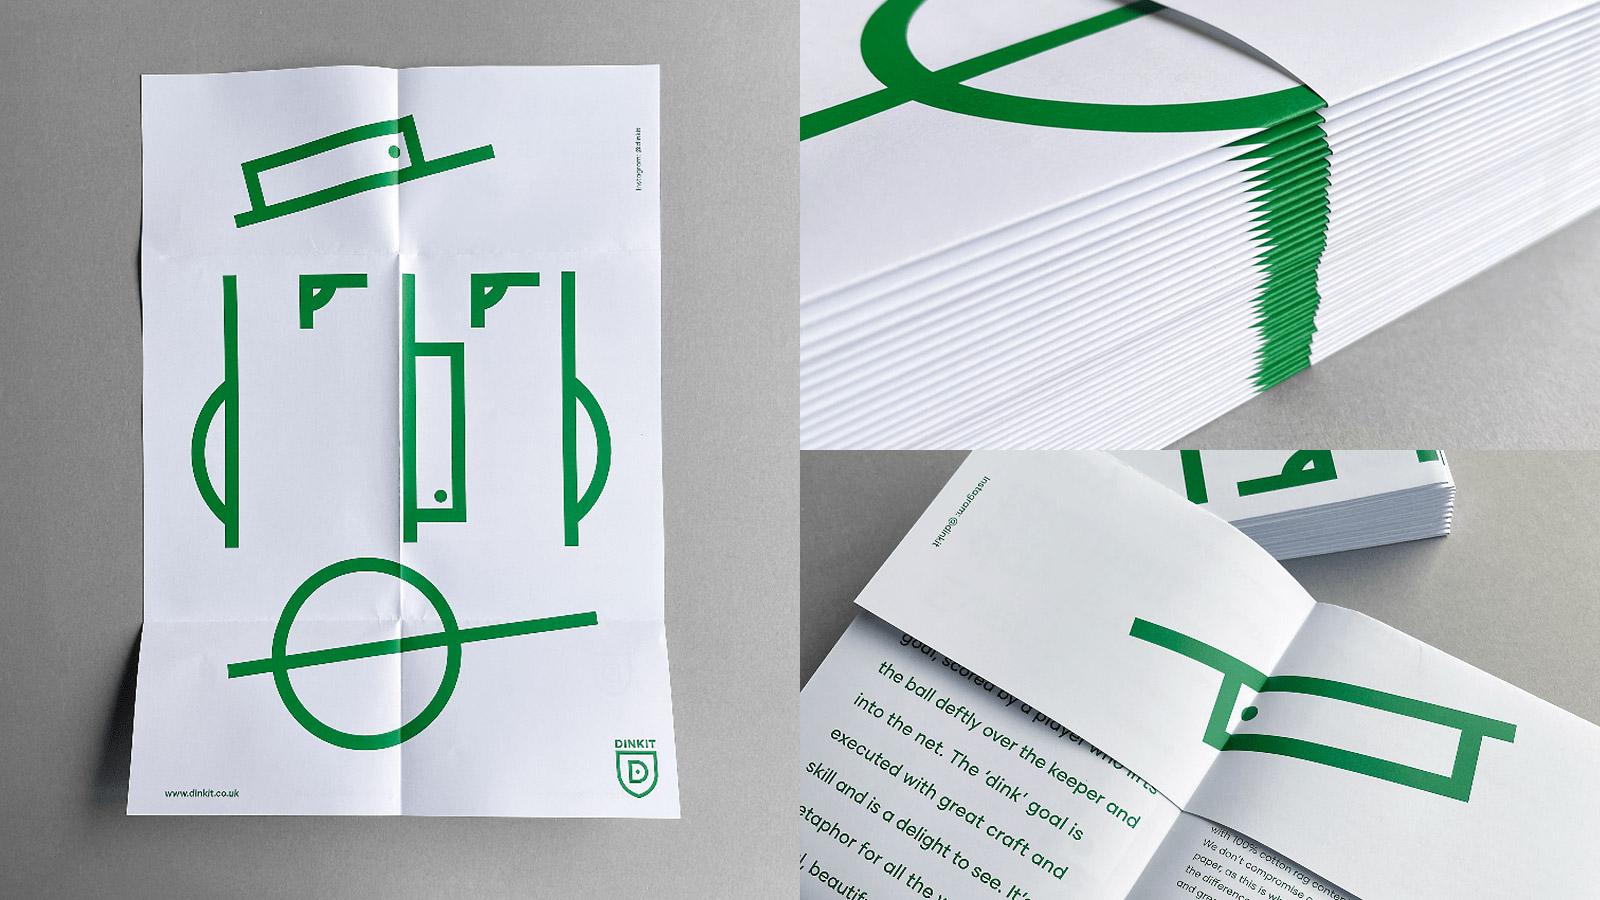 branding-identity-design-sport-football-graphics-dinkit-artwork-prints-posters-gallery-milton-keynes-london-9